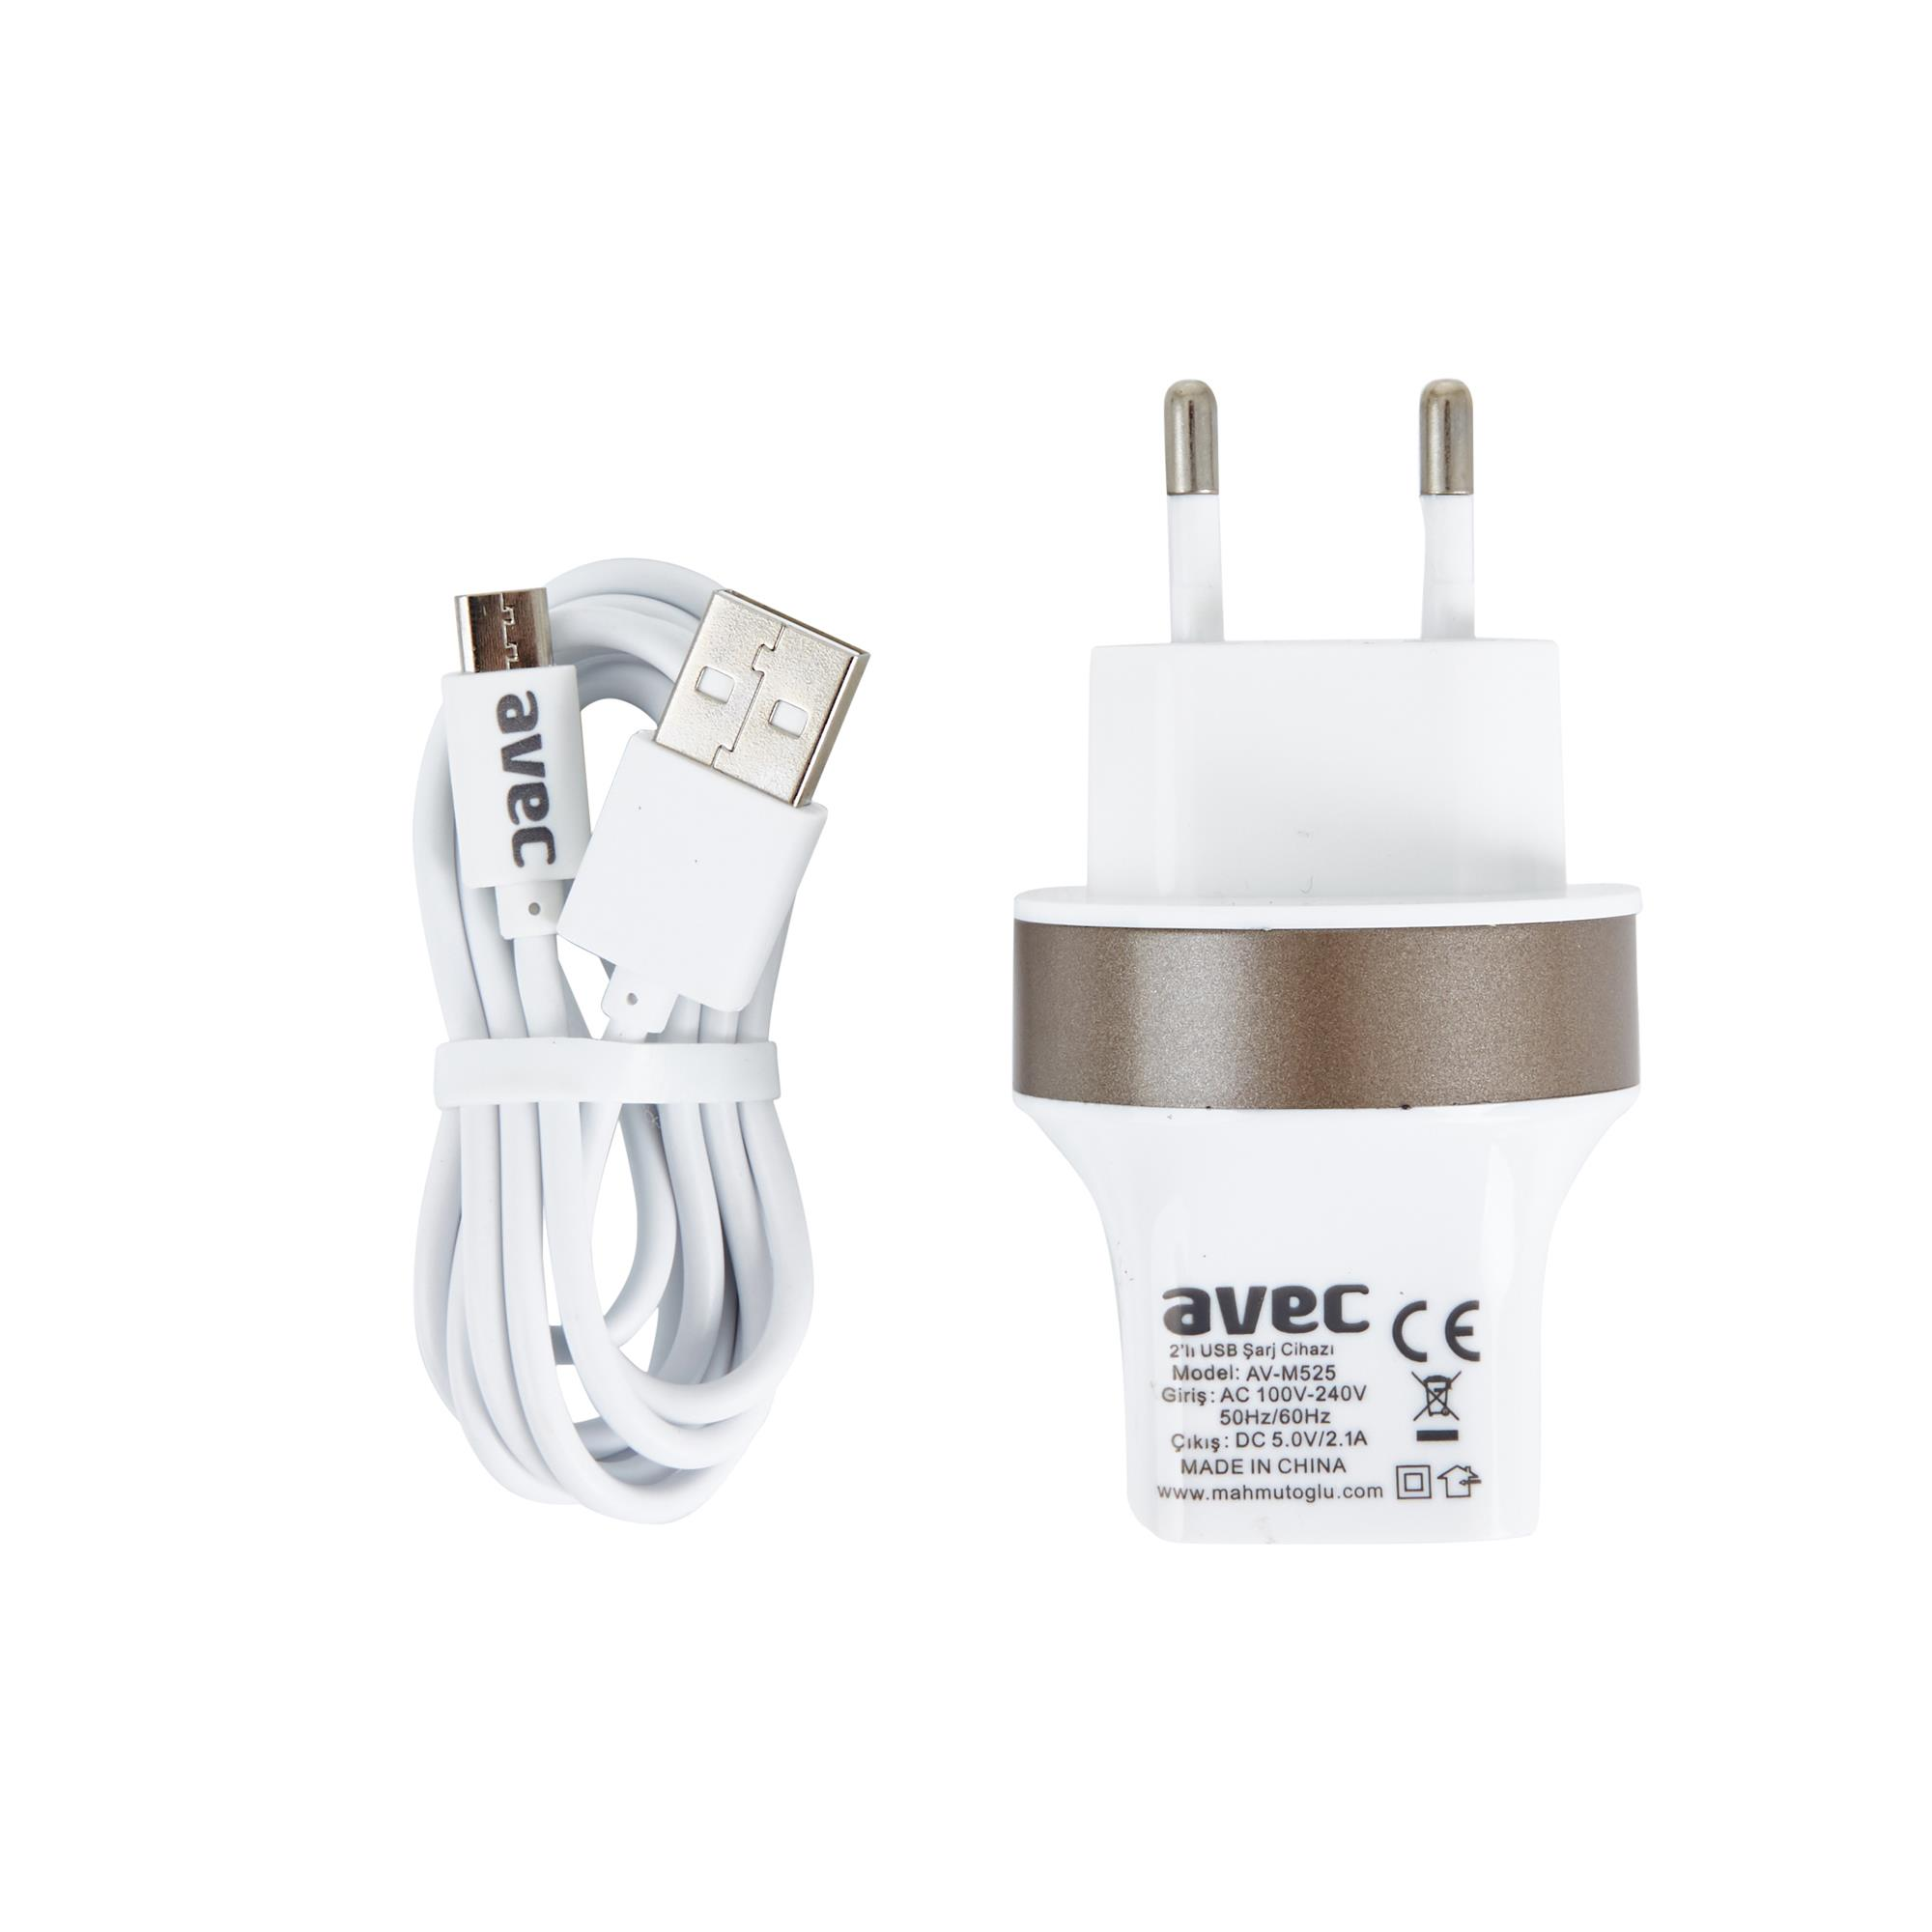 AVEC AV-M525 2.1A USB ŞARJ CİHAZI + AV-W101 MİCRO USB KABLO SETİ